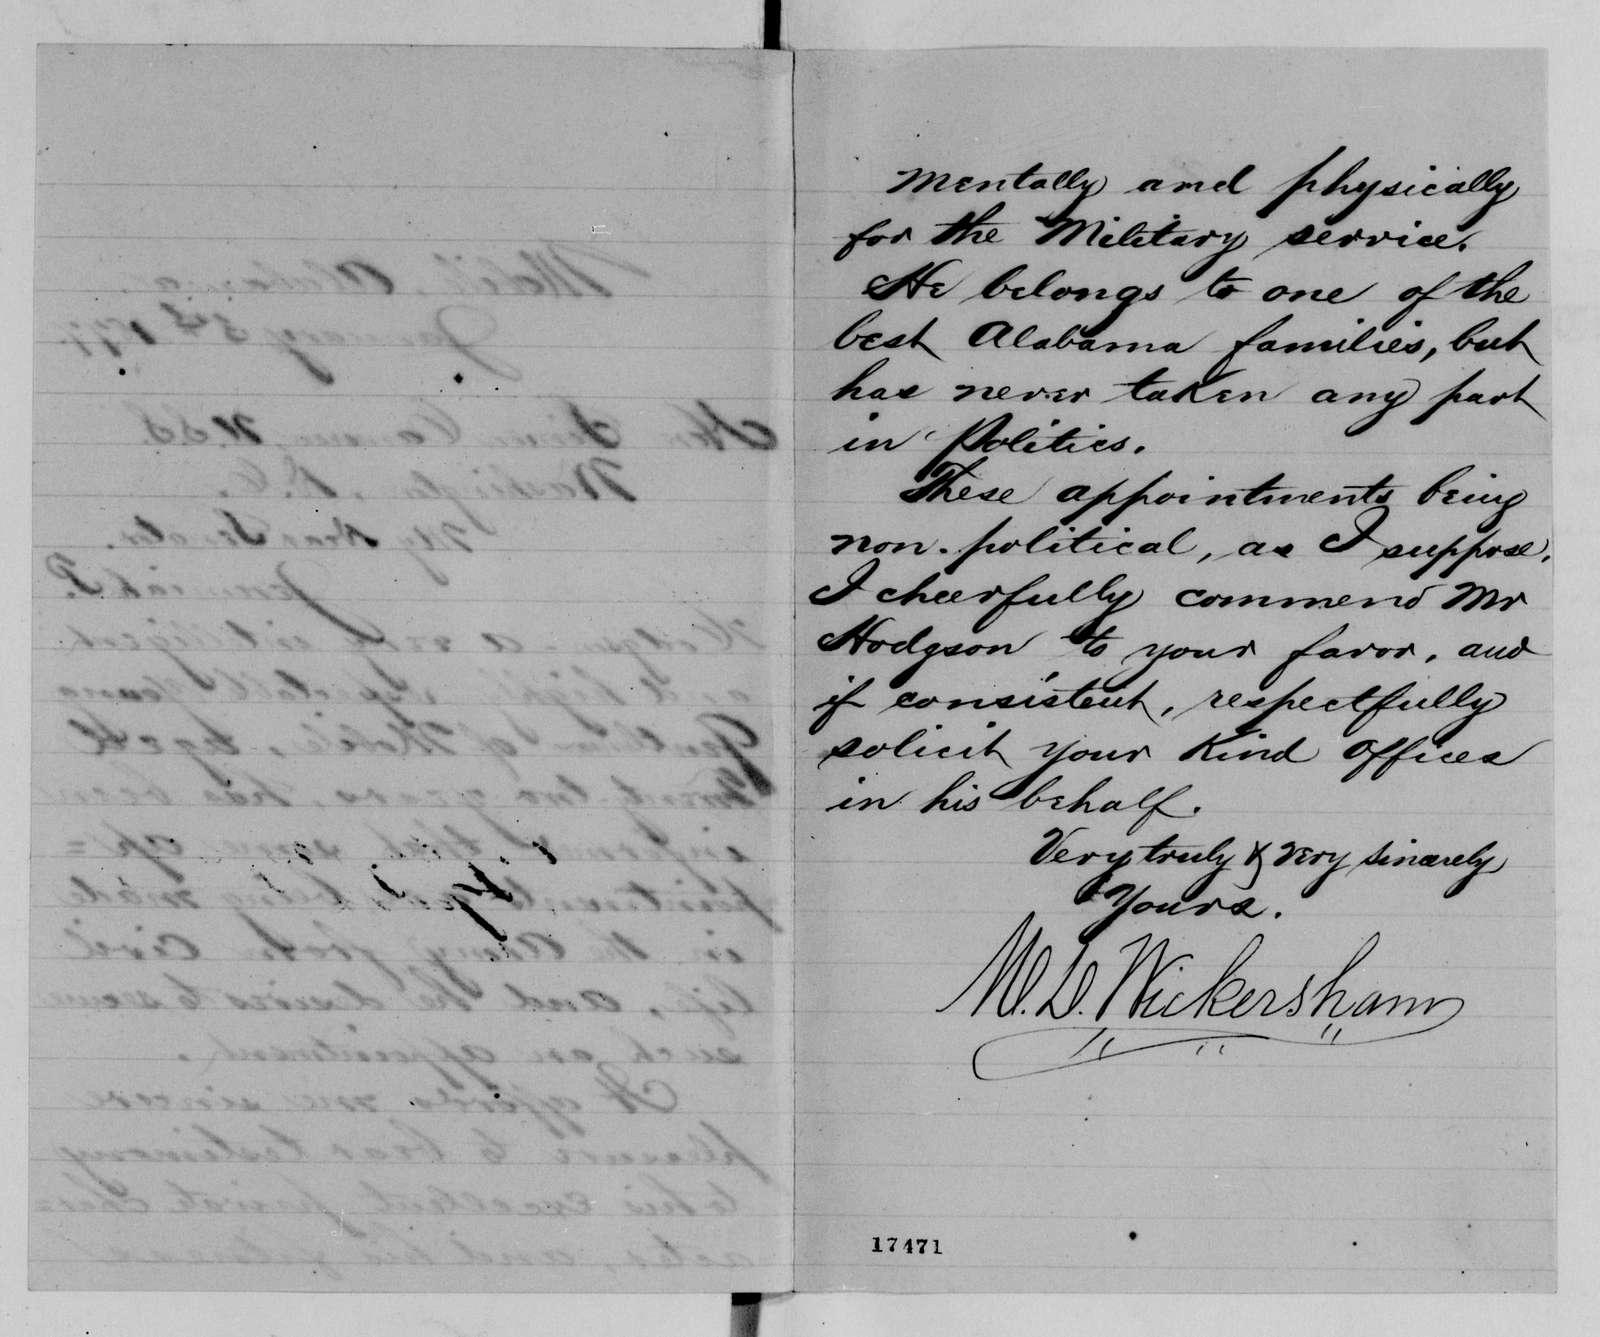 Alexander Hamilton Stephens Papers: General Correspondence, 1784-1886; 1876, Dec. 4-1877, Mar. 2